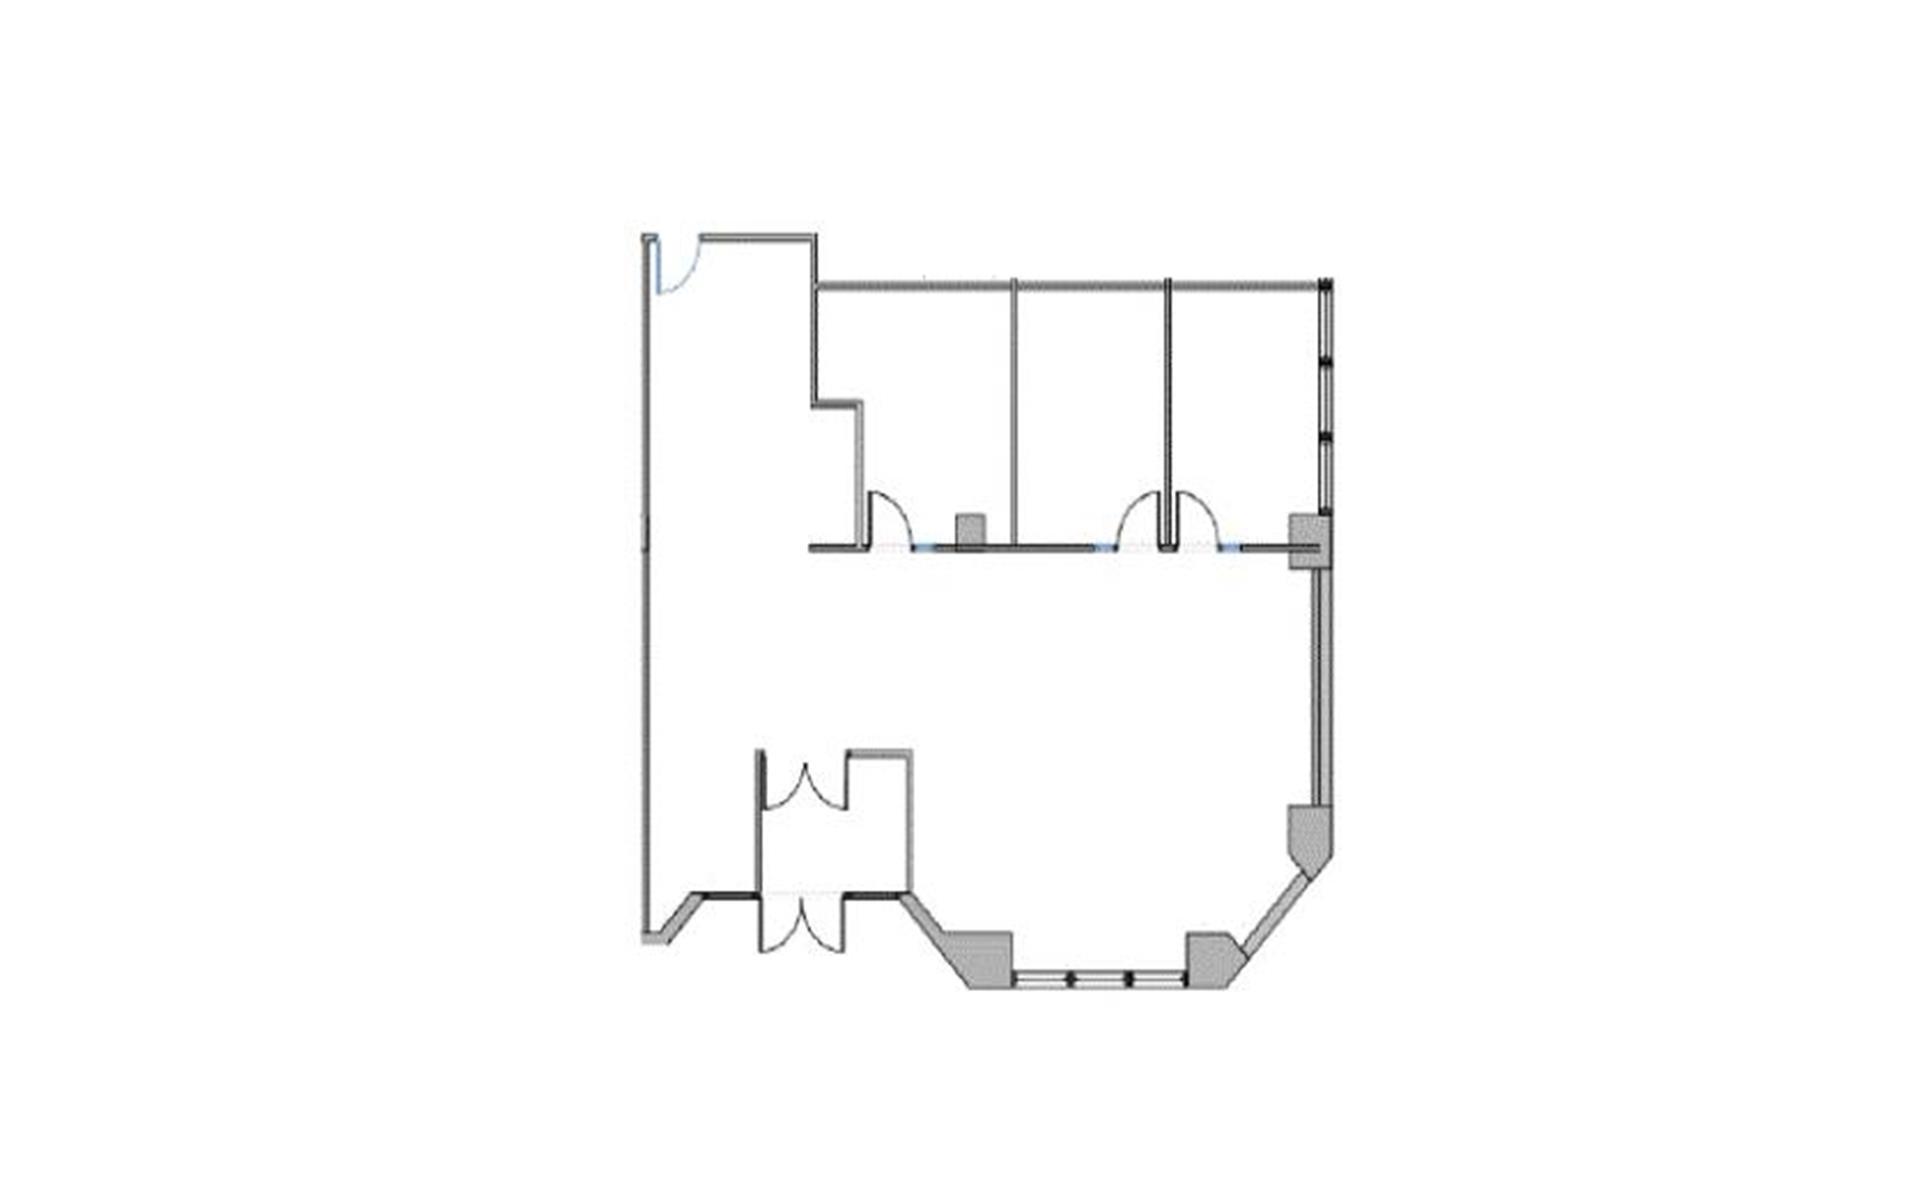 Boxer - One Century Centre - Team Space | Suite 130